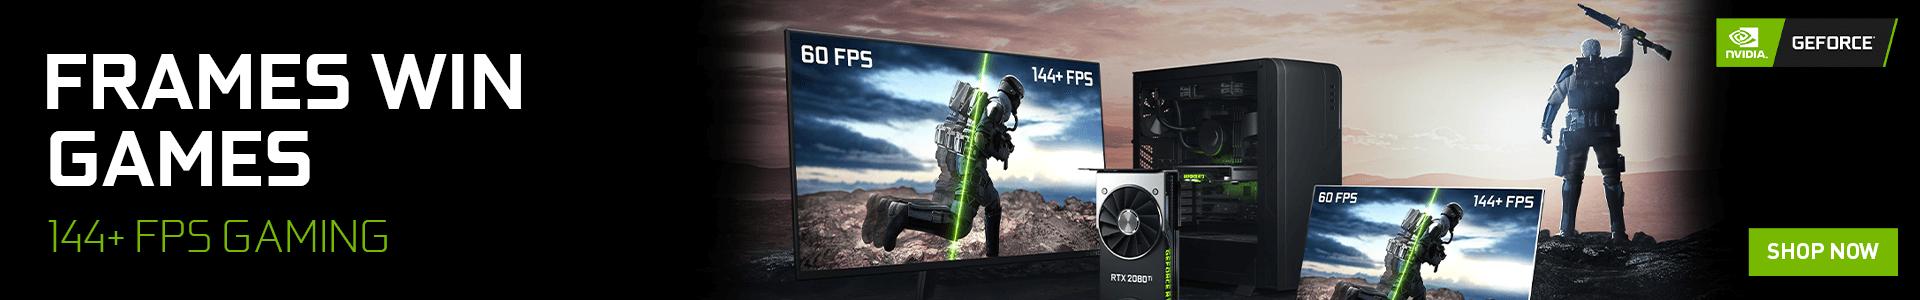 Nvidia Frame Wins Games Offer